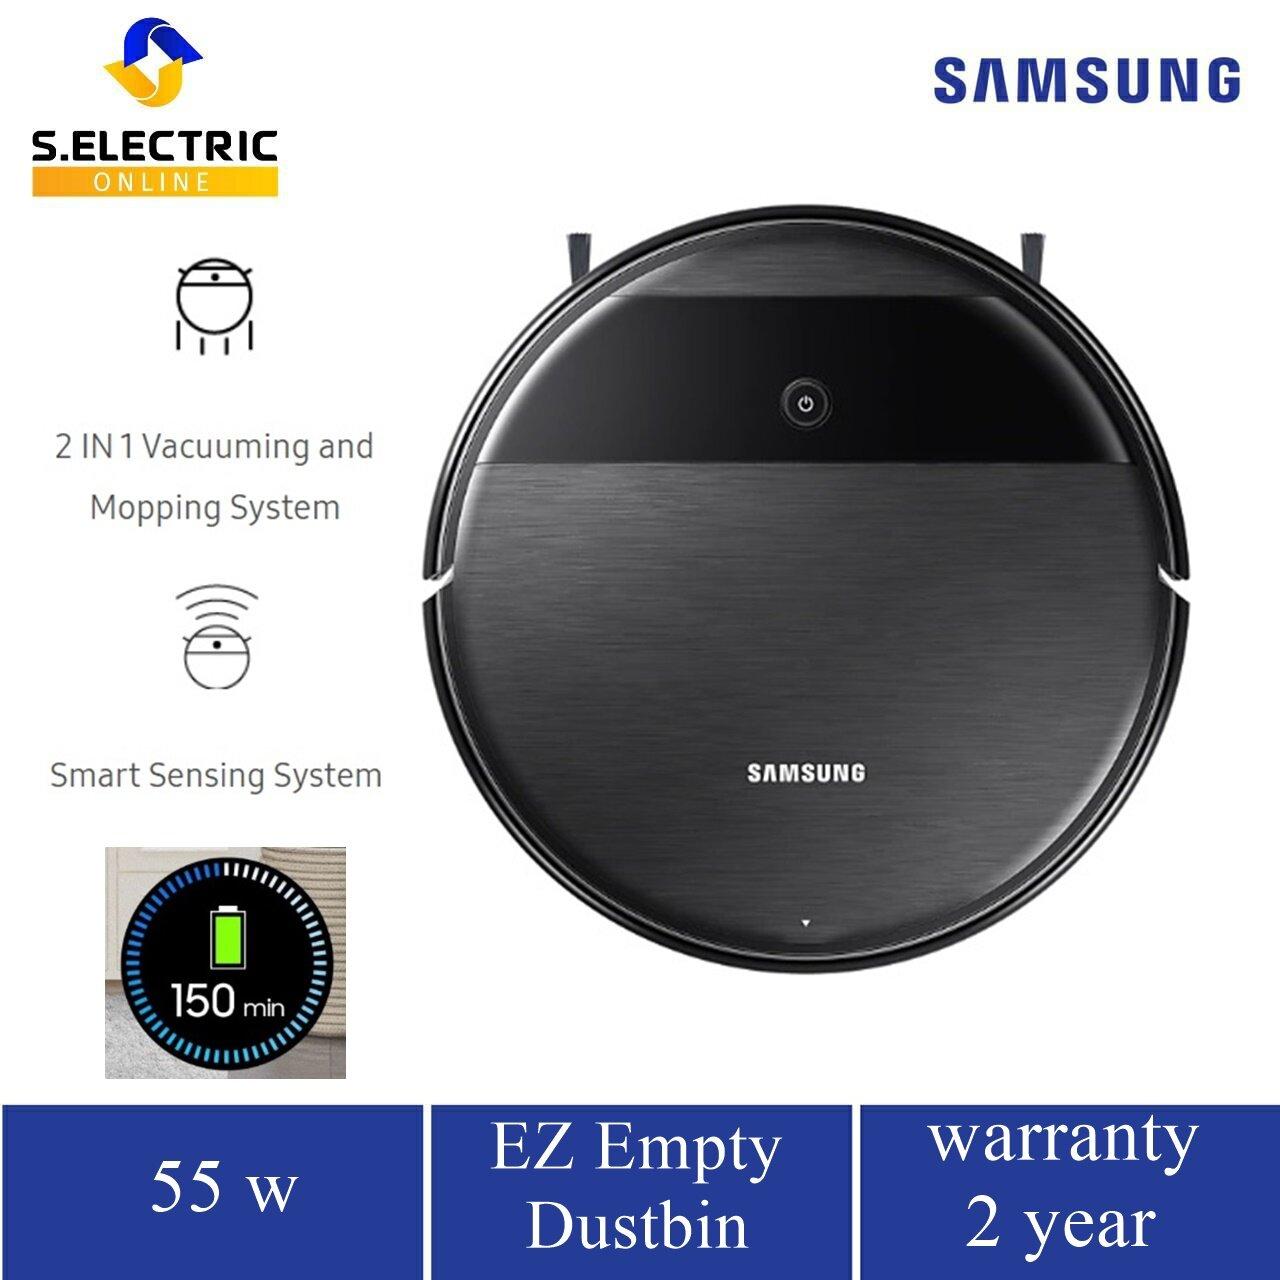 Samsung หุ่นยนต์ดูดฝุ่น รุ่น VR05R5050WK/ST 2 in 1 Cleaning System ทั้งดูดและถูพร้อมๆกัน